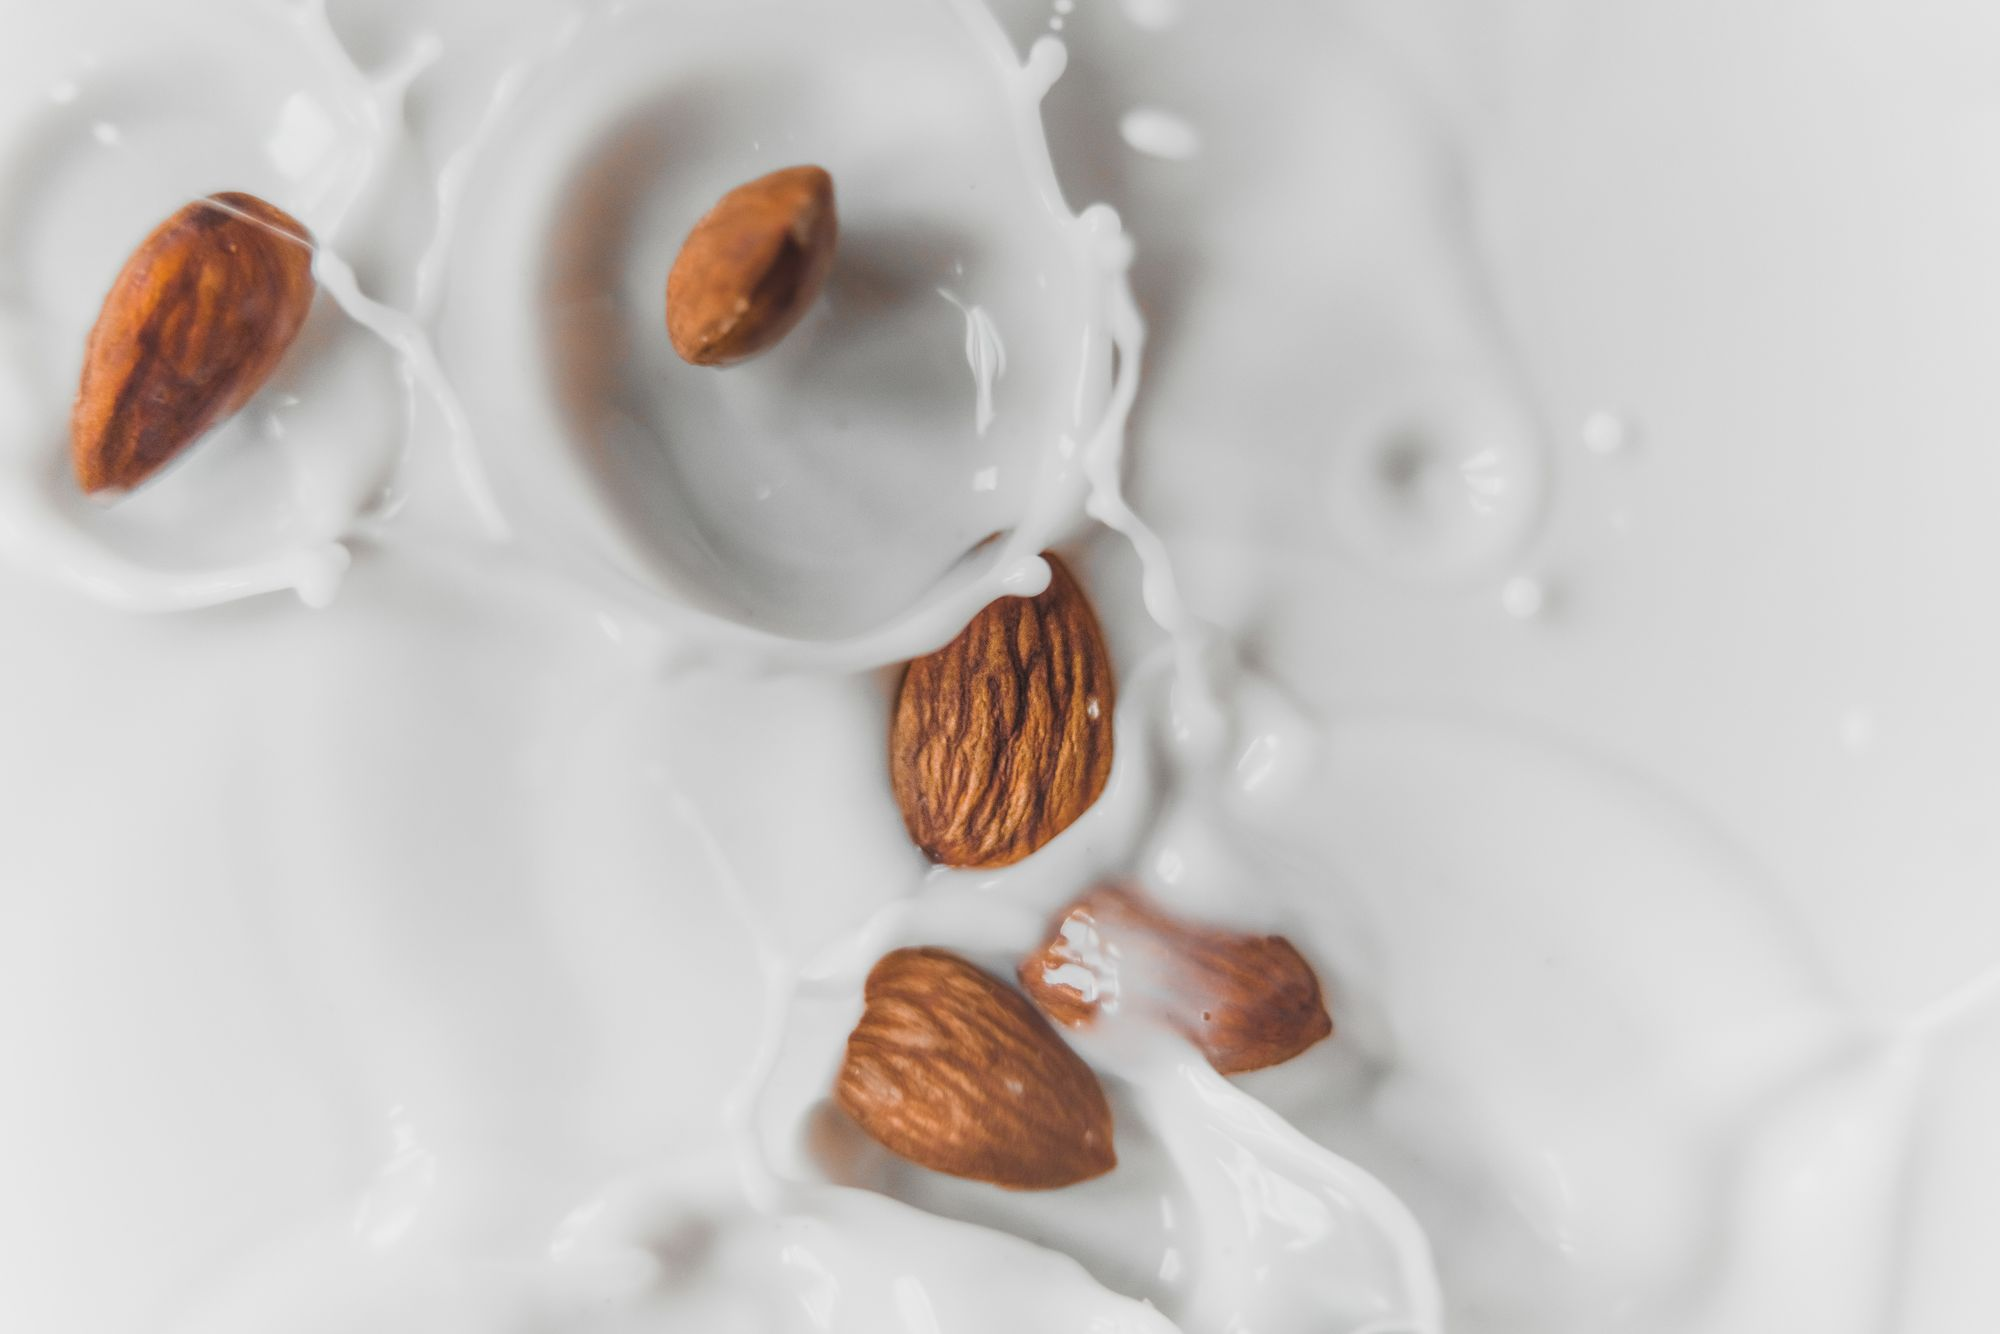 The Almond Milk and Avocado Dilemma